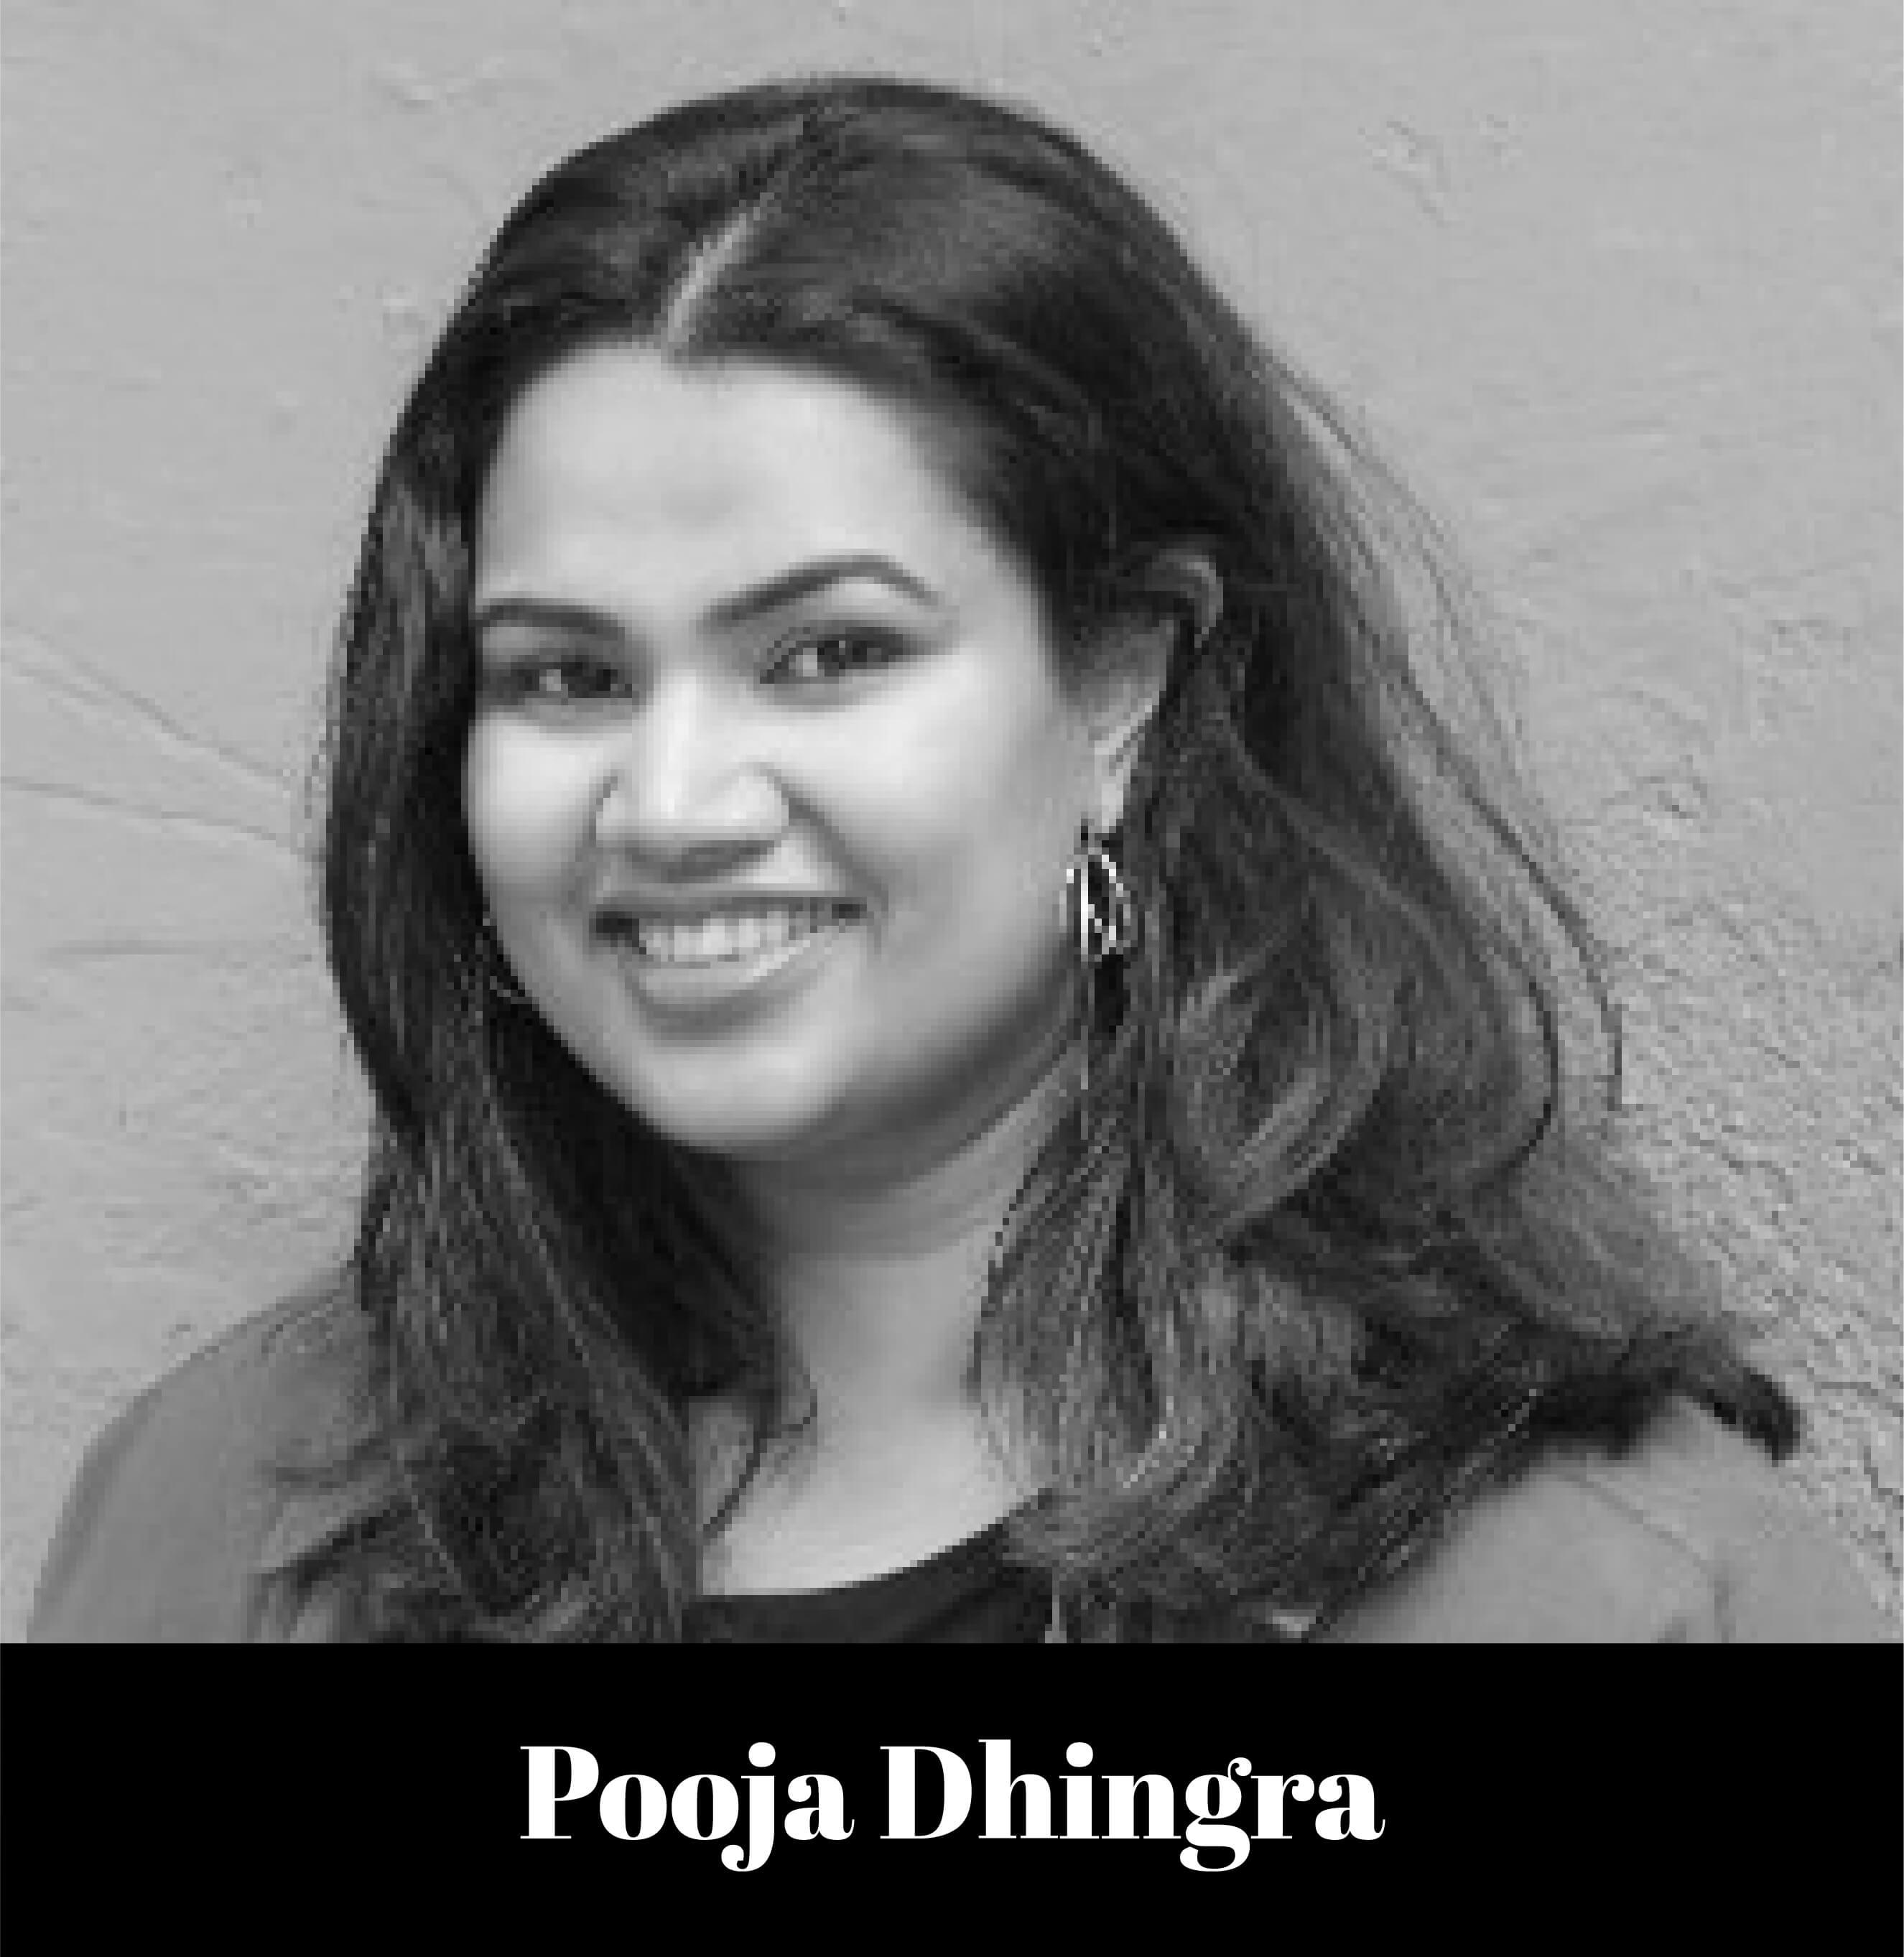 Pooja-dhingra_1.jpg